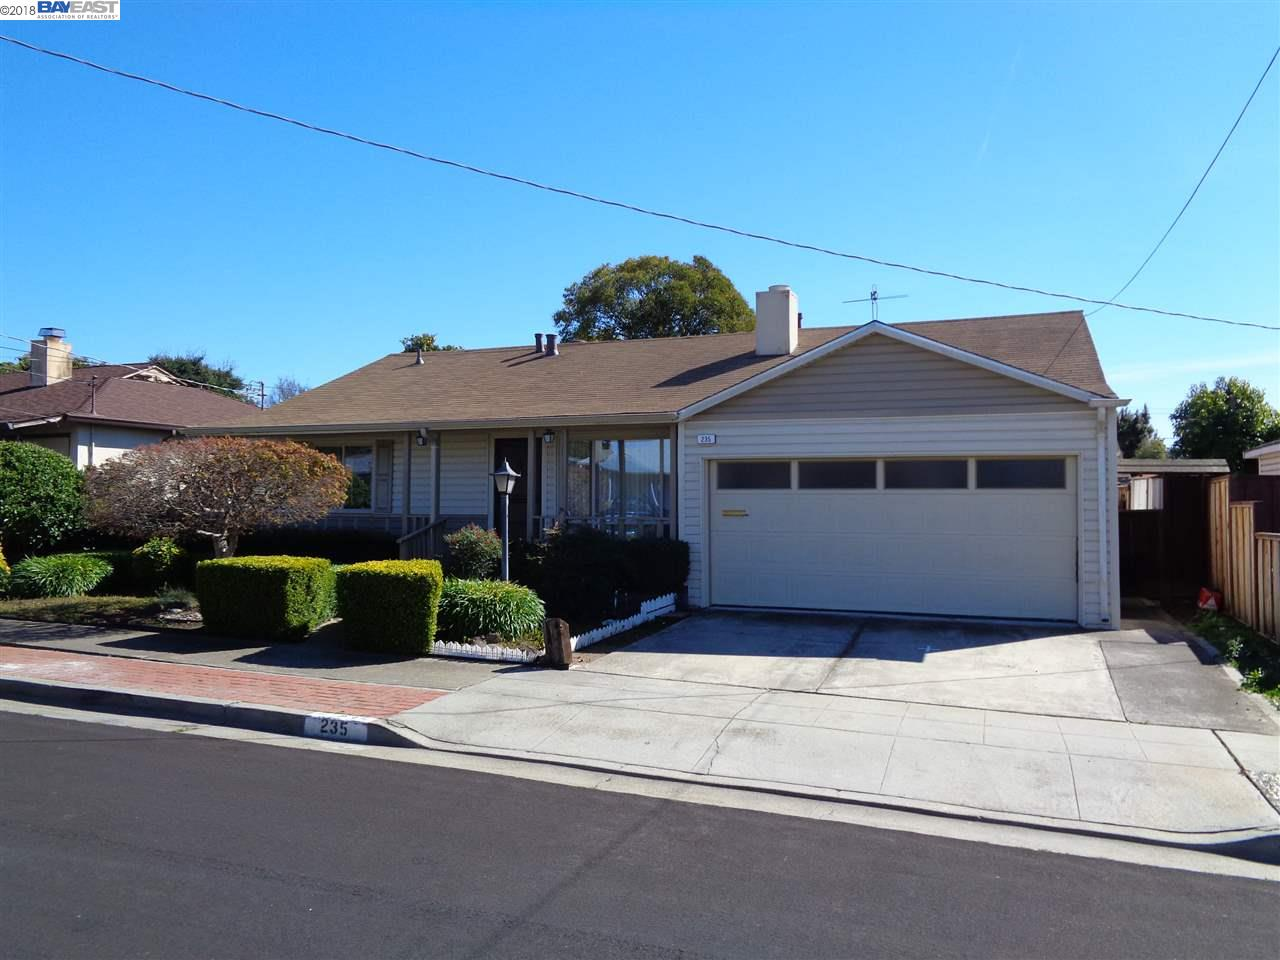 235 NEWTON STREET, Hayward, CA 94544-2927 $680,000 www.calnest.com ...